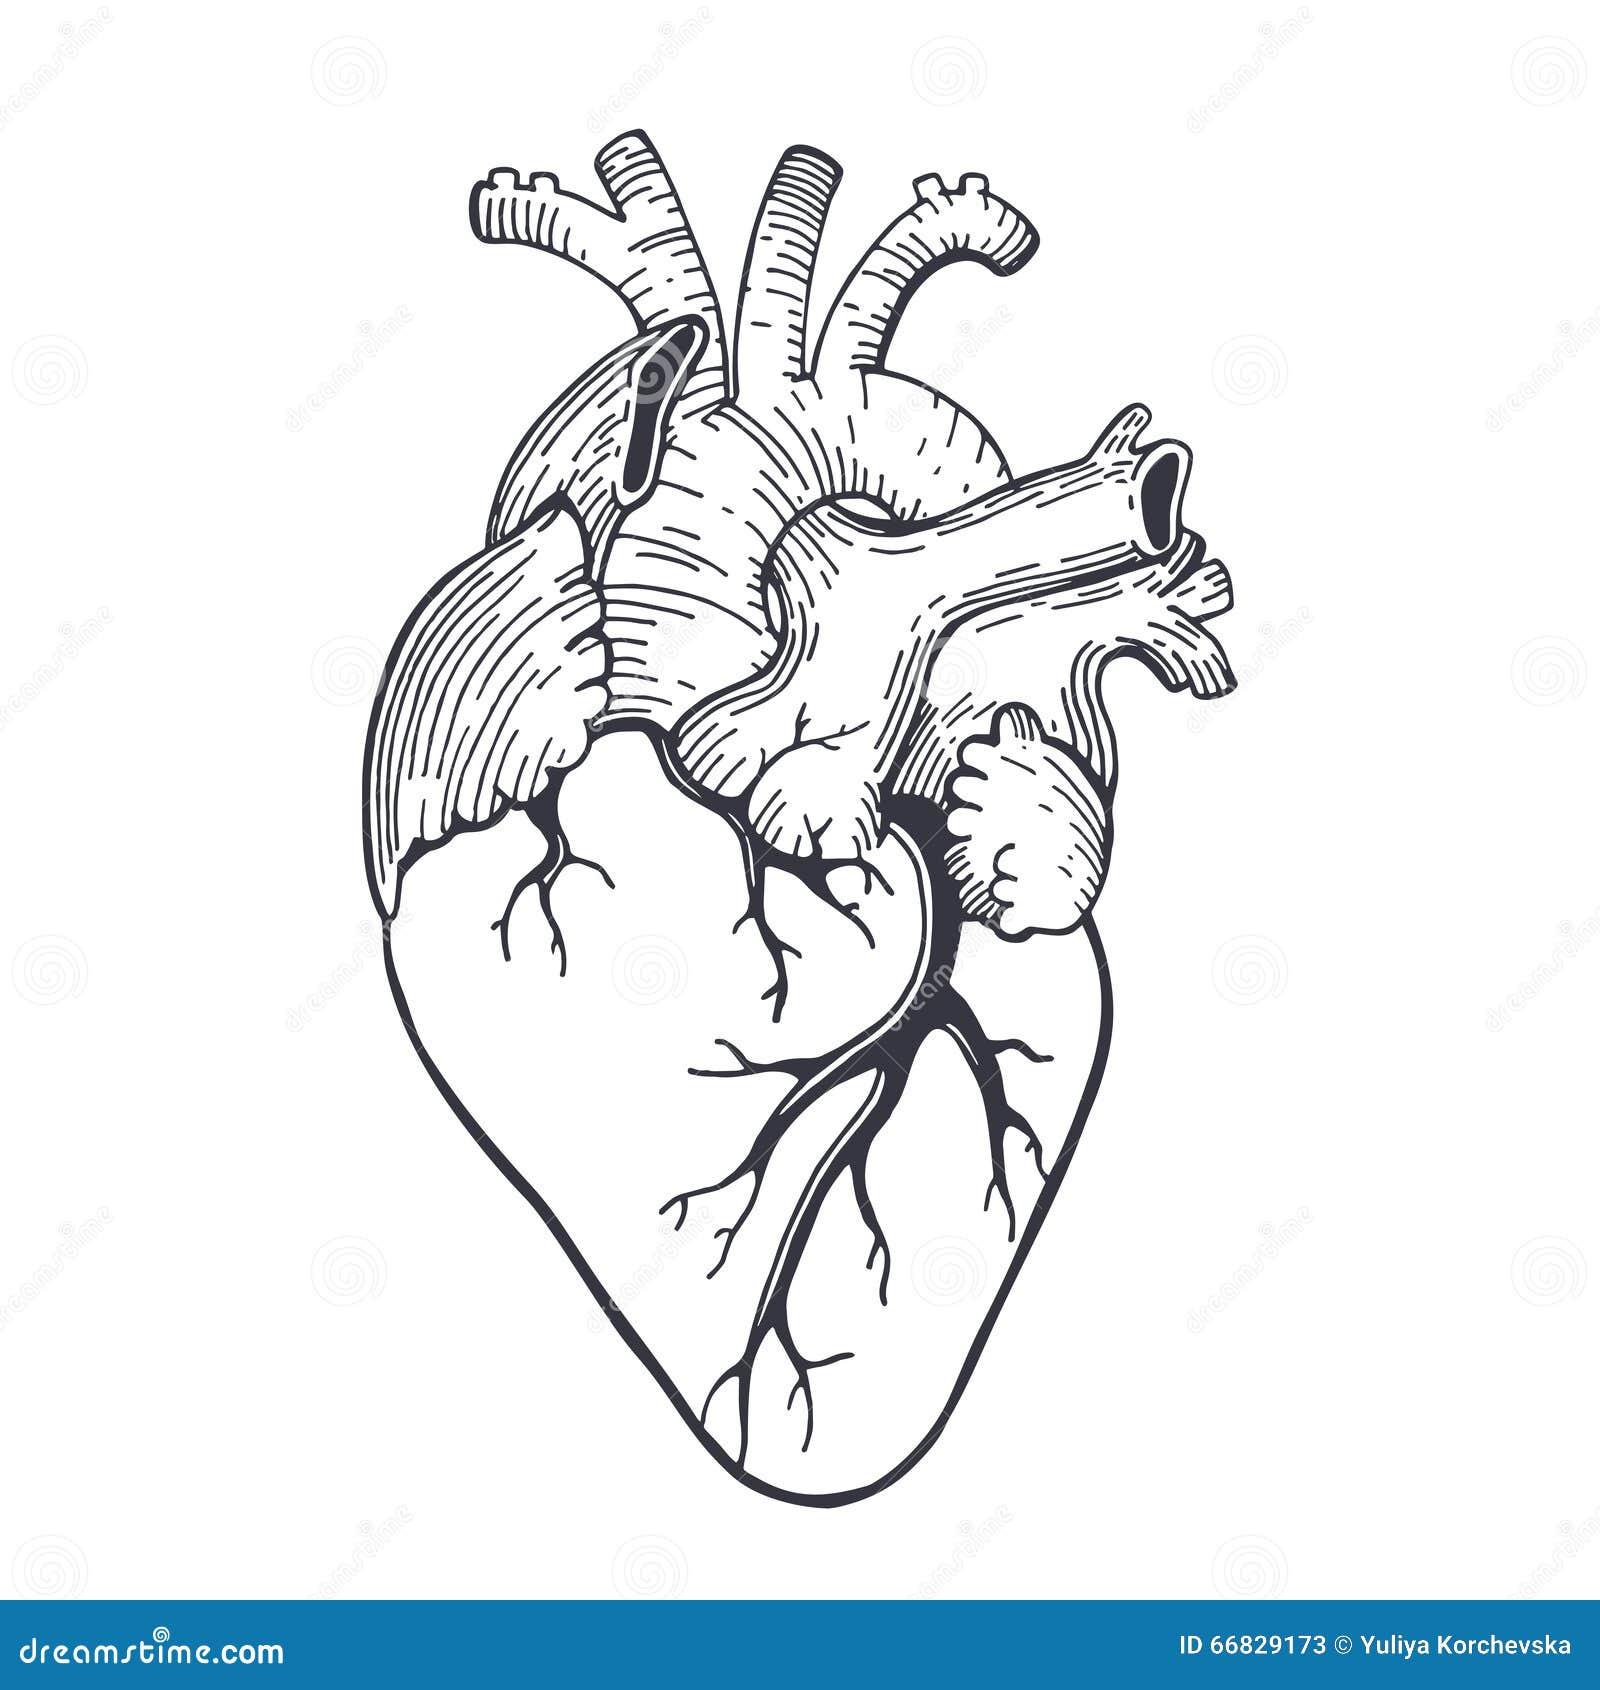 Simple Heart Line Art : Realistic sketch illustration stock vector image